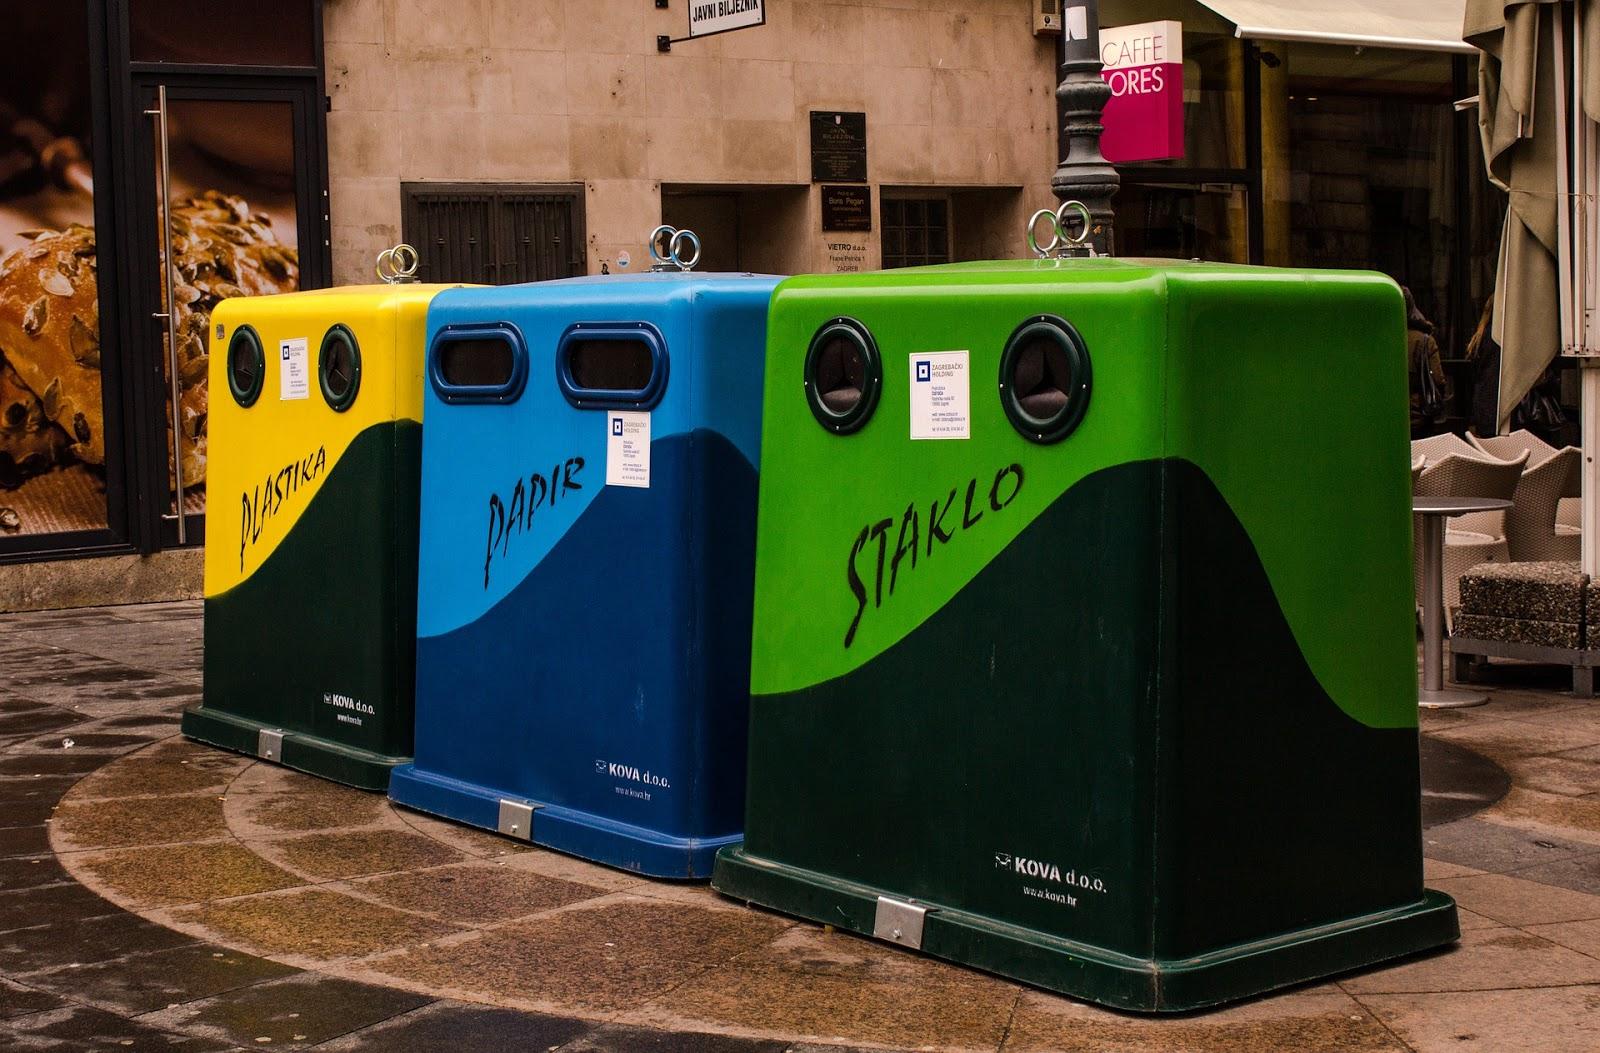 No 1 Junk Street World Recycling Waste Segregation